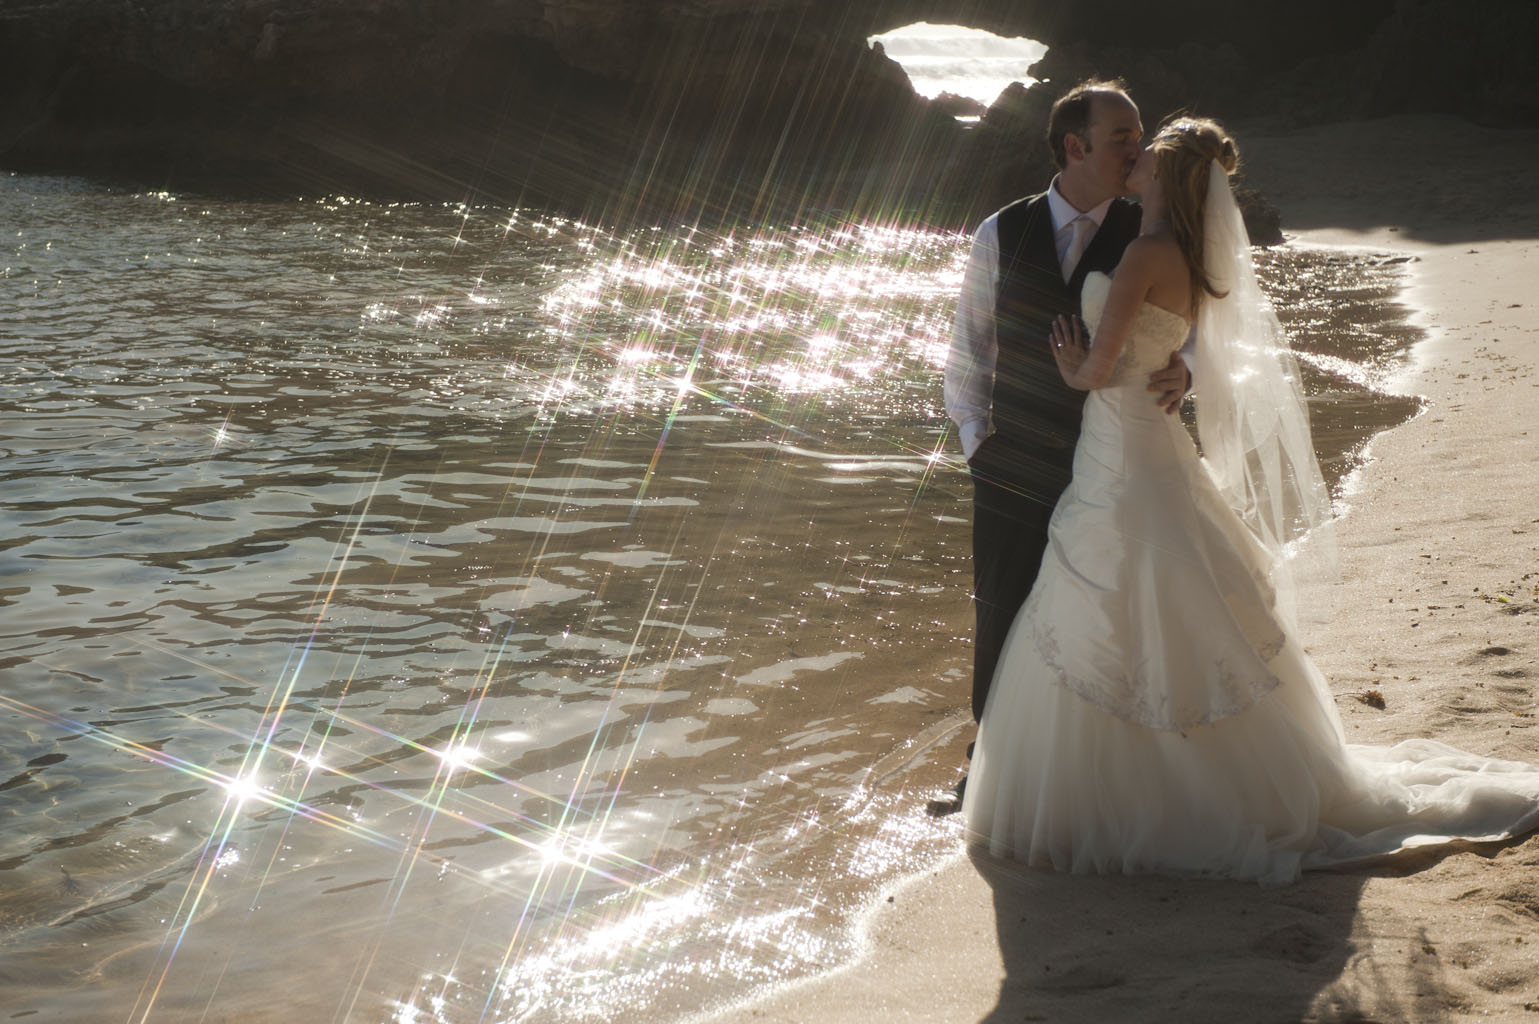 beach wedding photo with sun sparkles on water